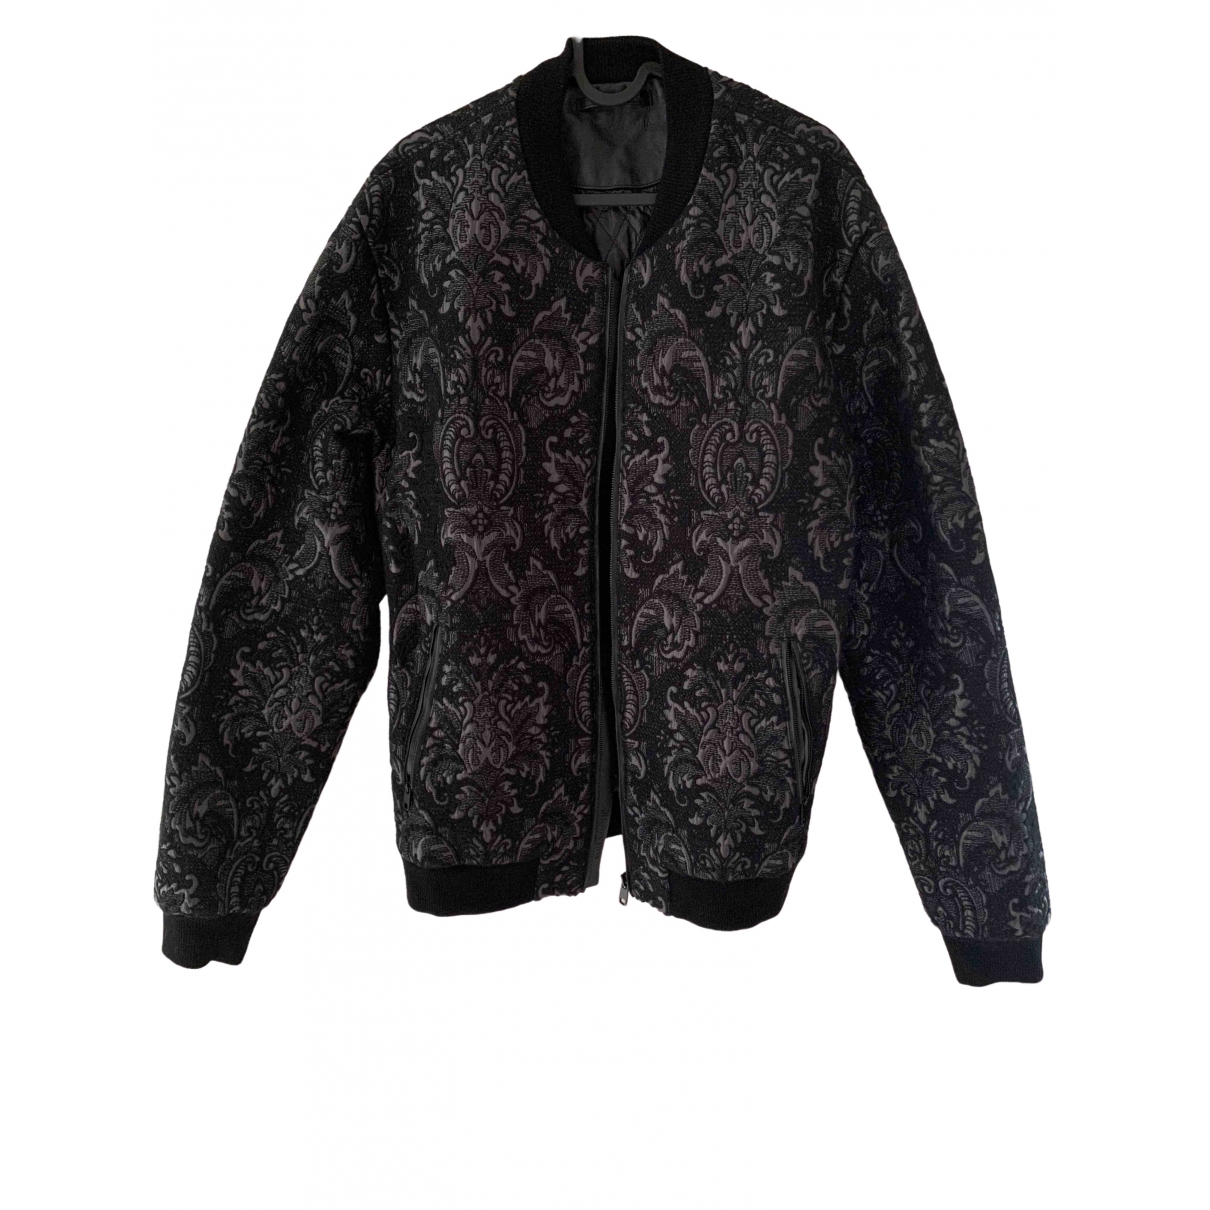 Dolce & Gabbana \N Jacke in  Schwarz Polyester